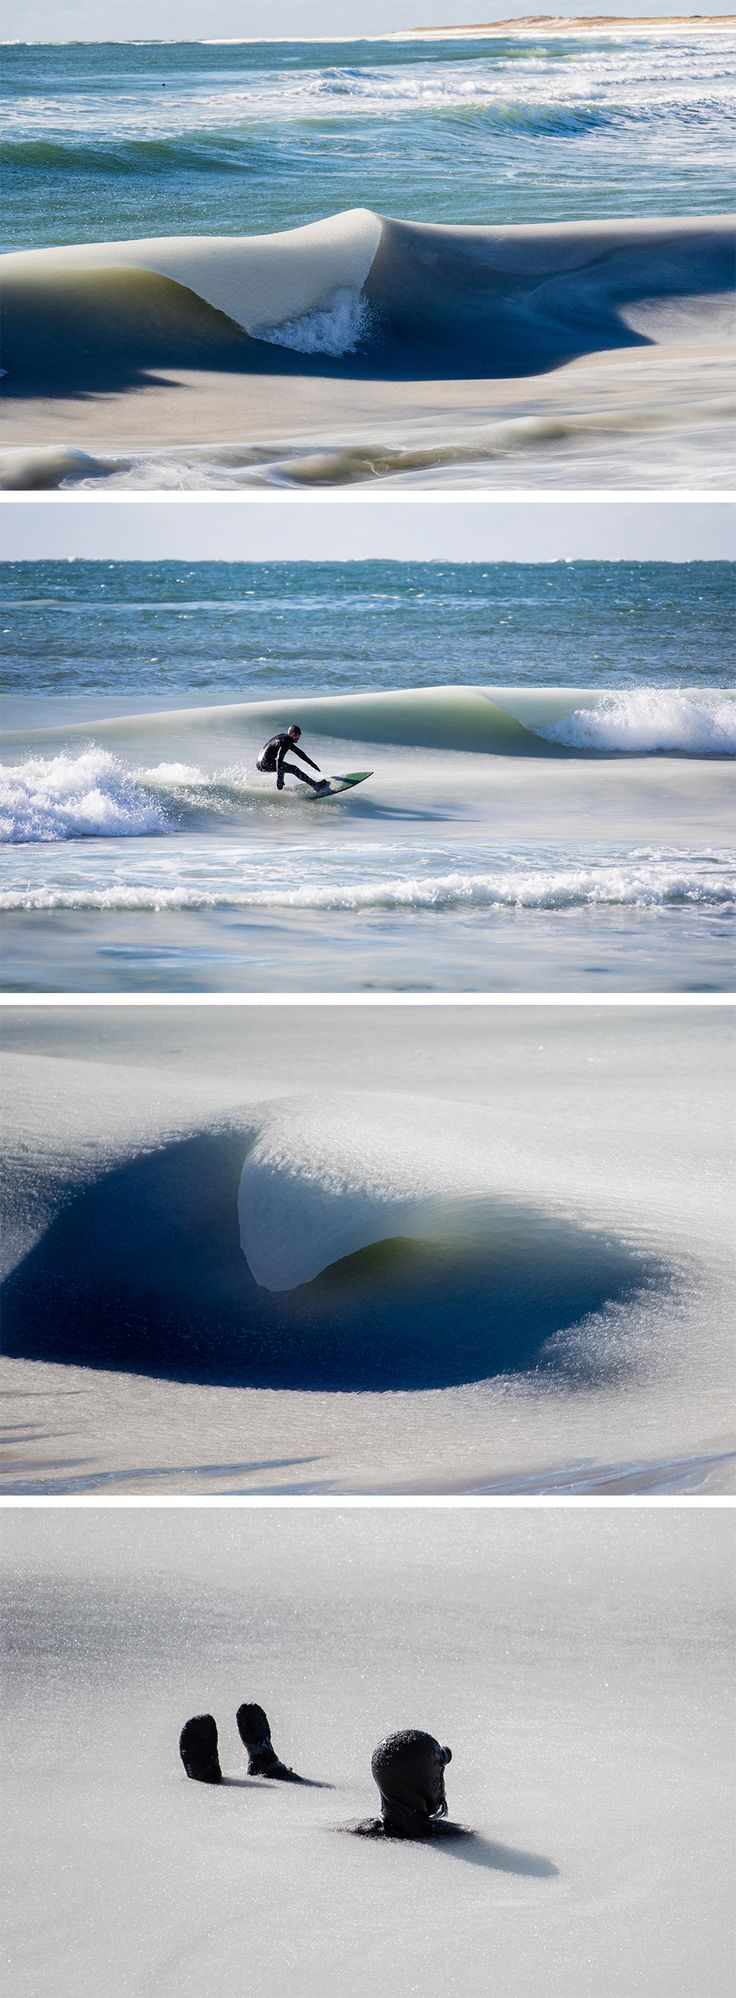 Nearly Frozen 'Slurpee' Waves Surge off the Coast of Nantucket